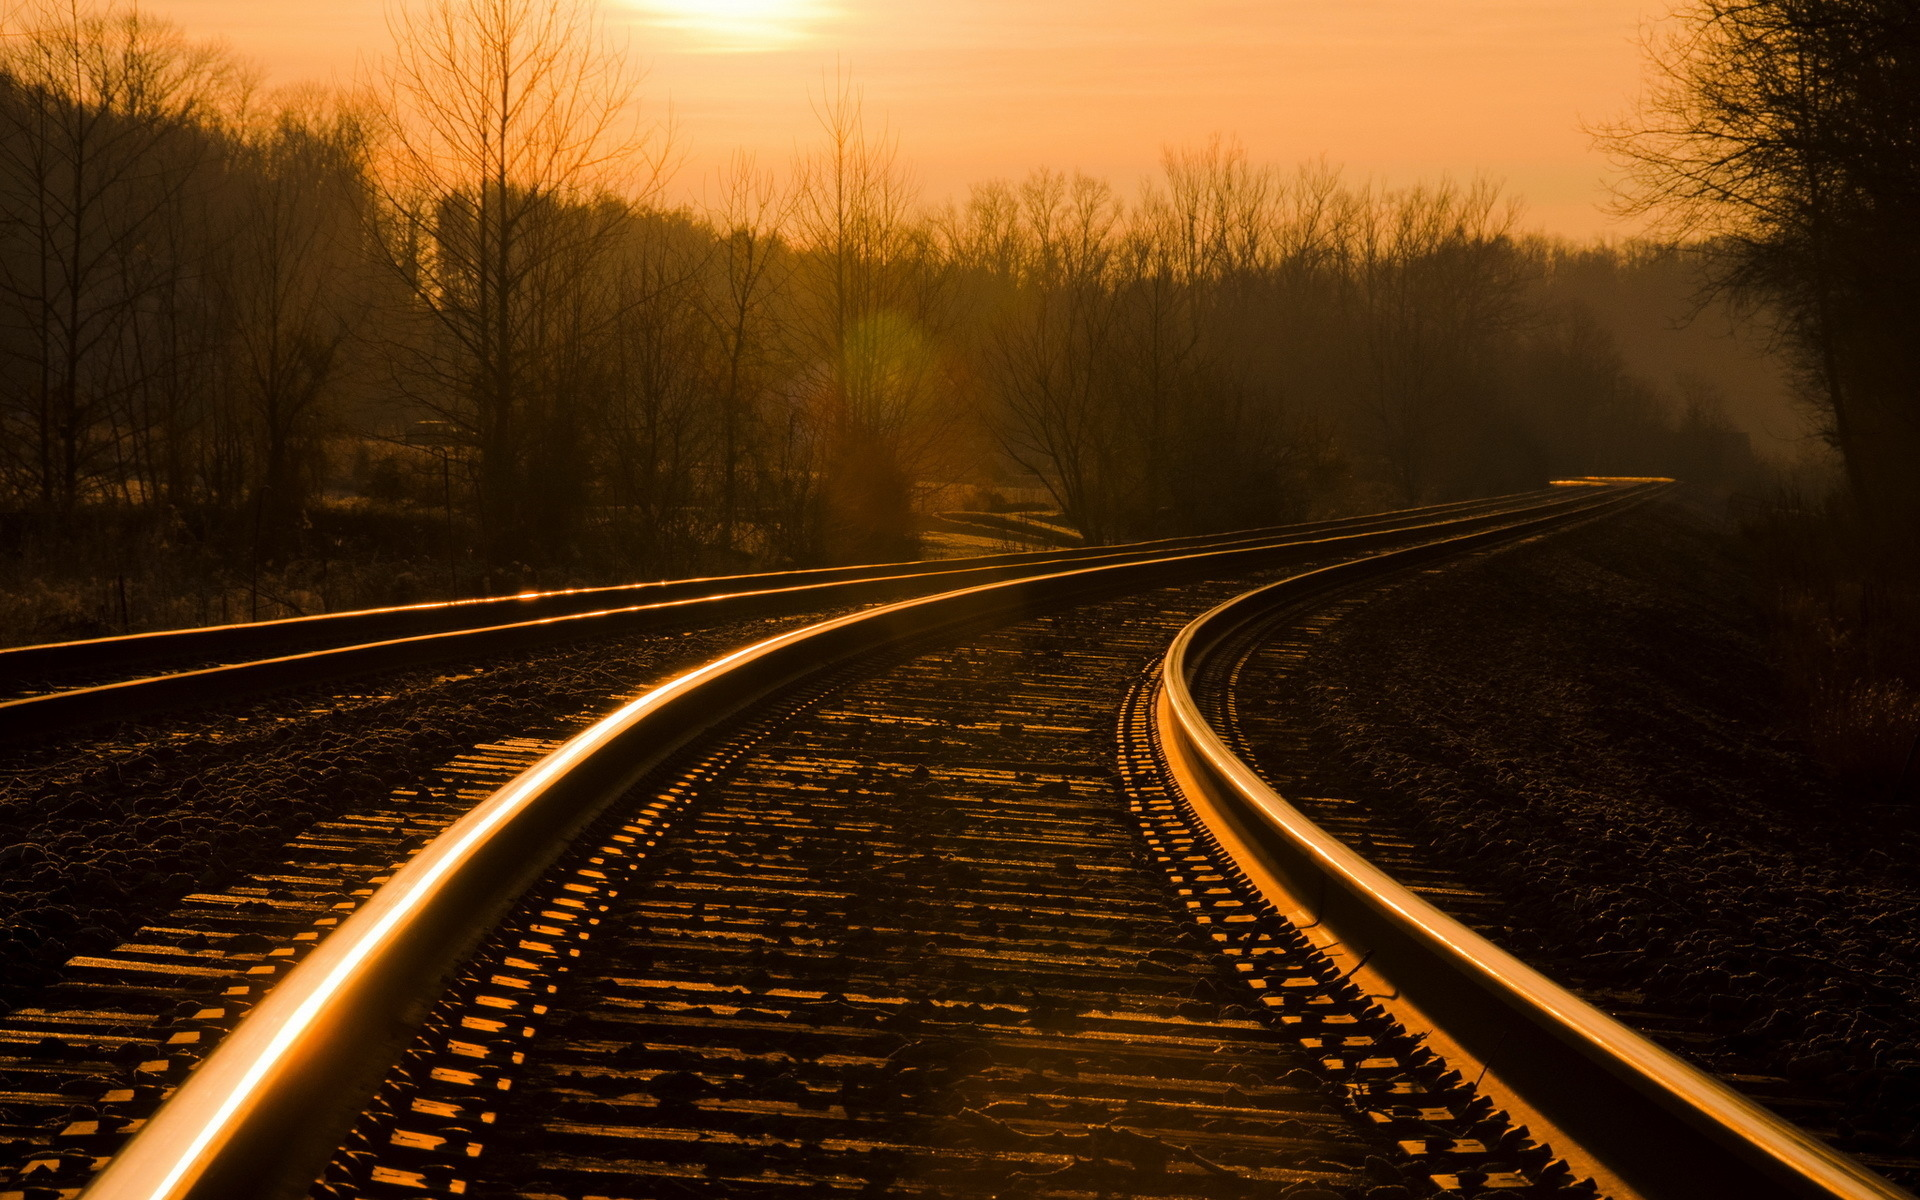 Trains railroad tracks 1920x1200